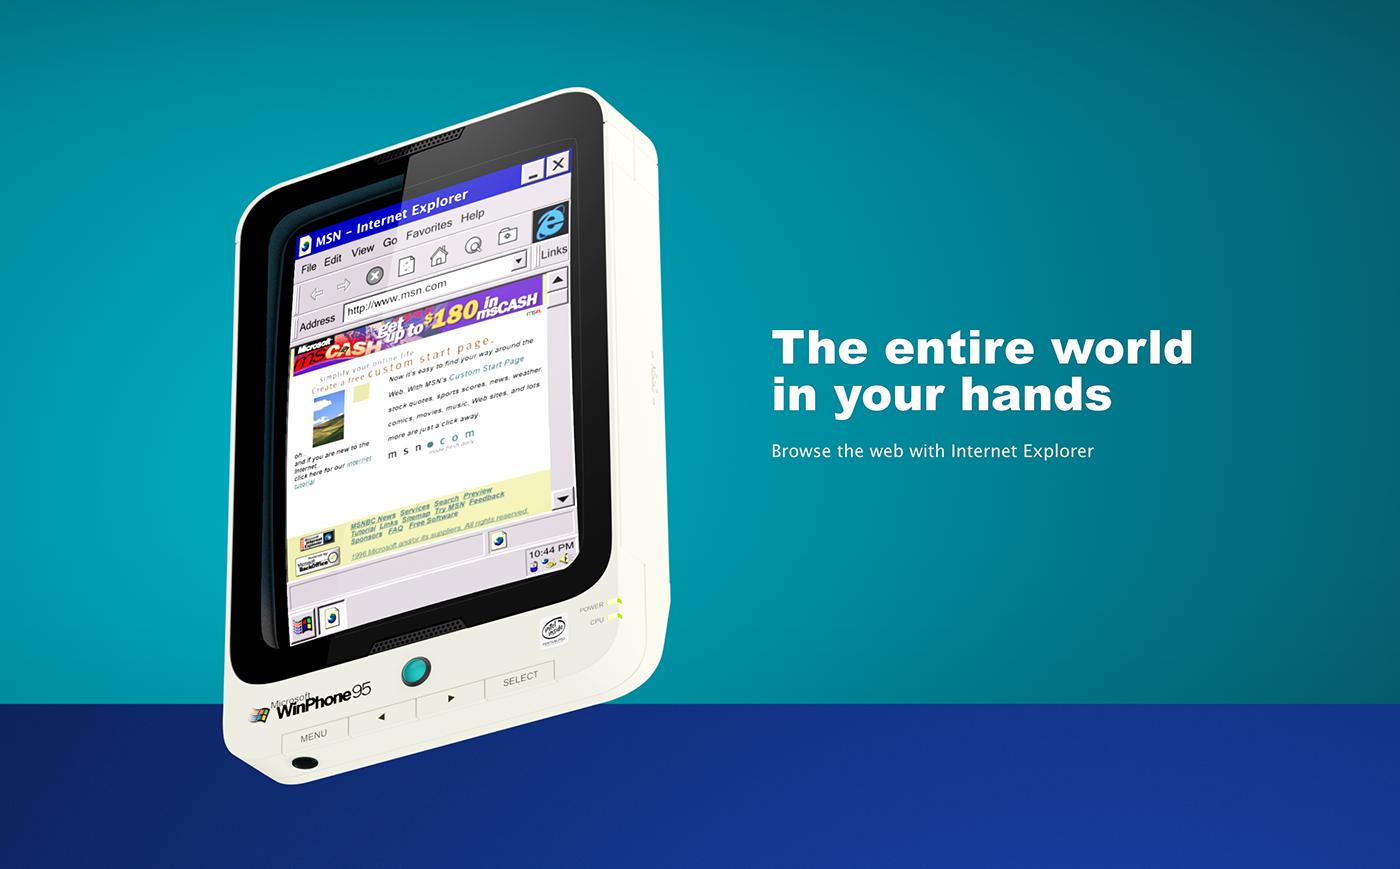 windows 95 windows phone windows Microsoft mobile UI 3D smartphone nostalgic Retro